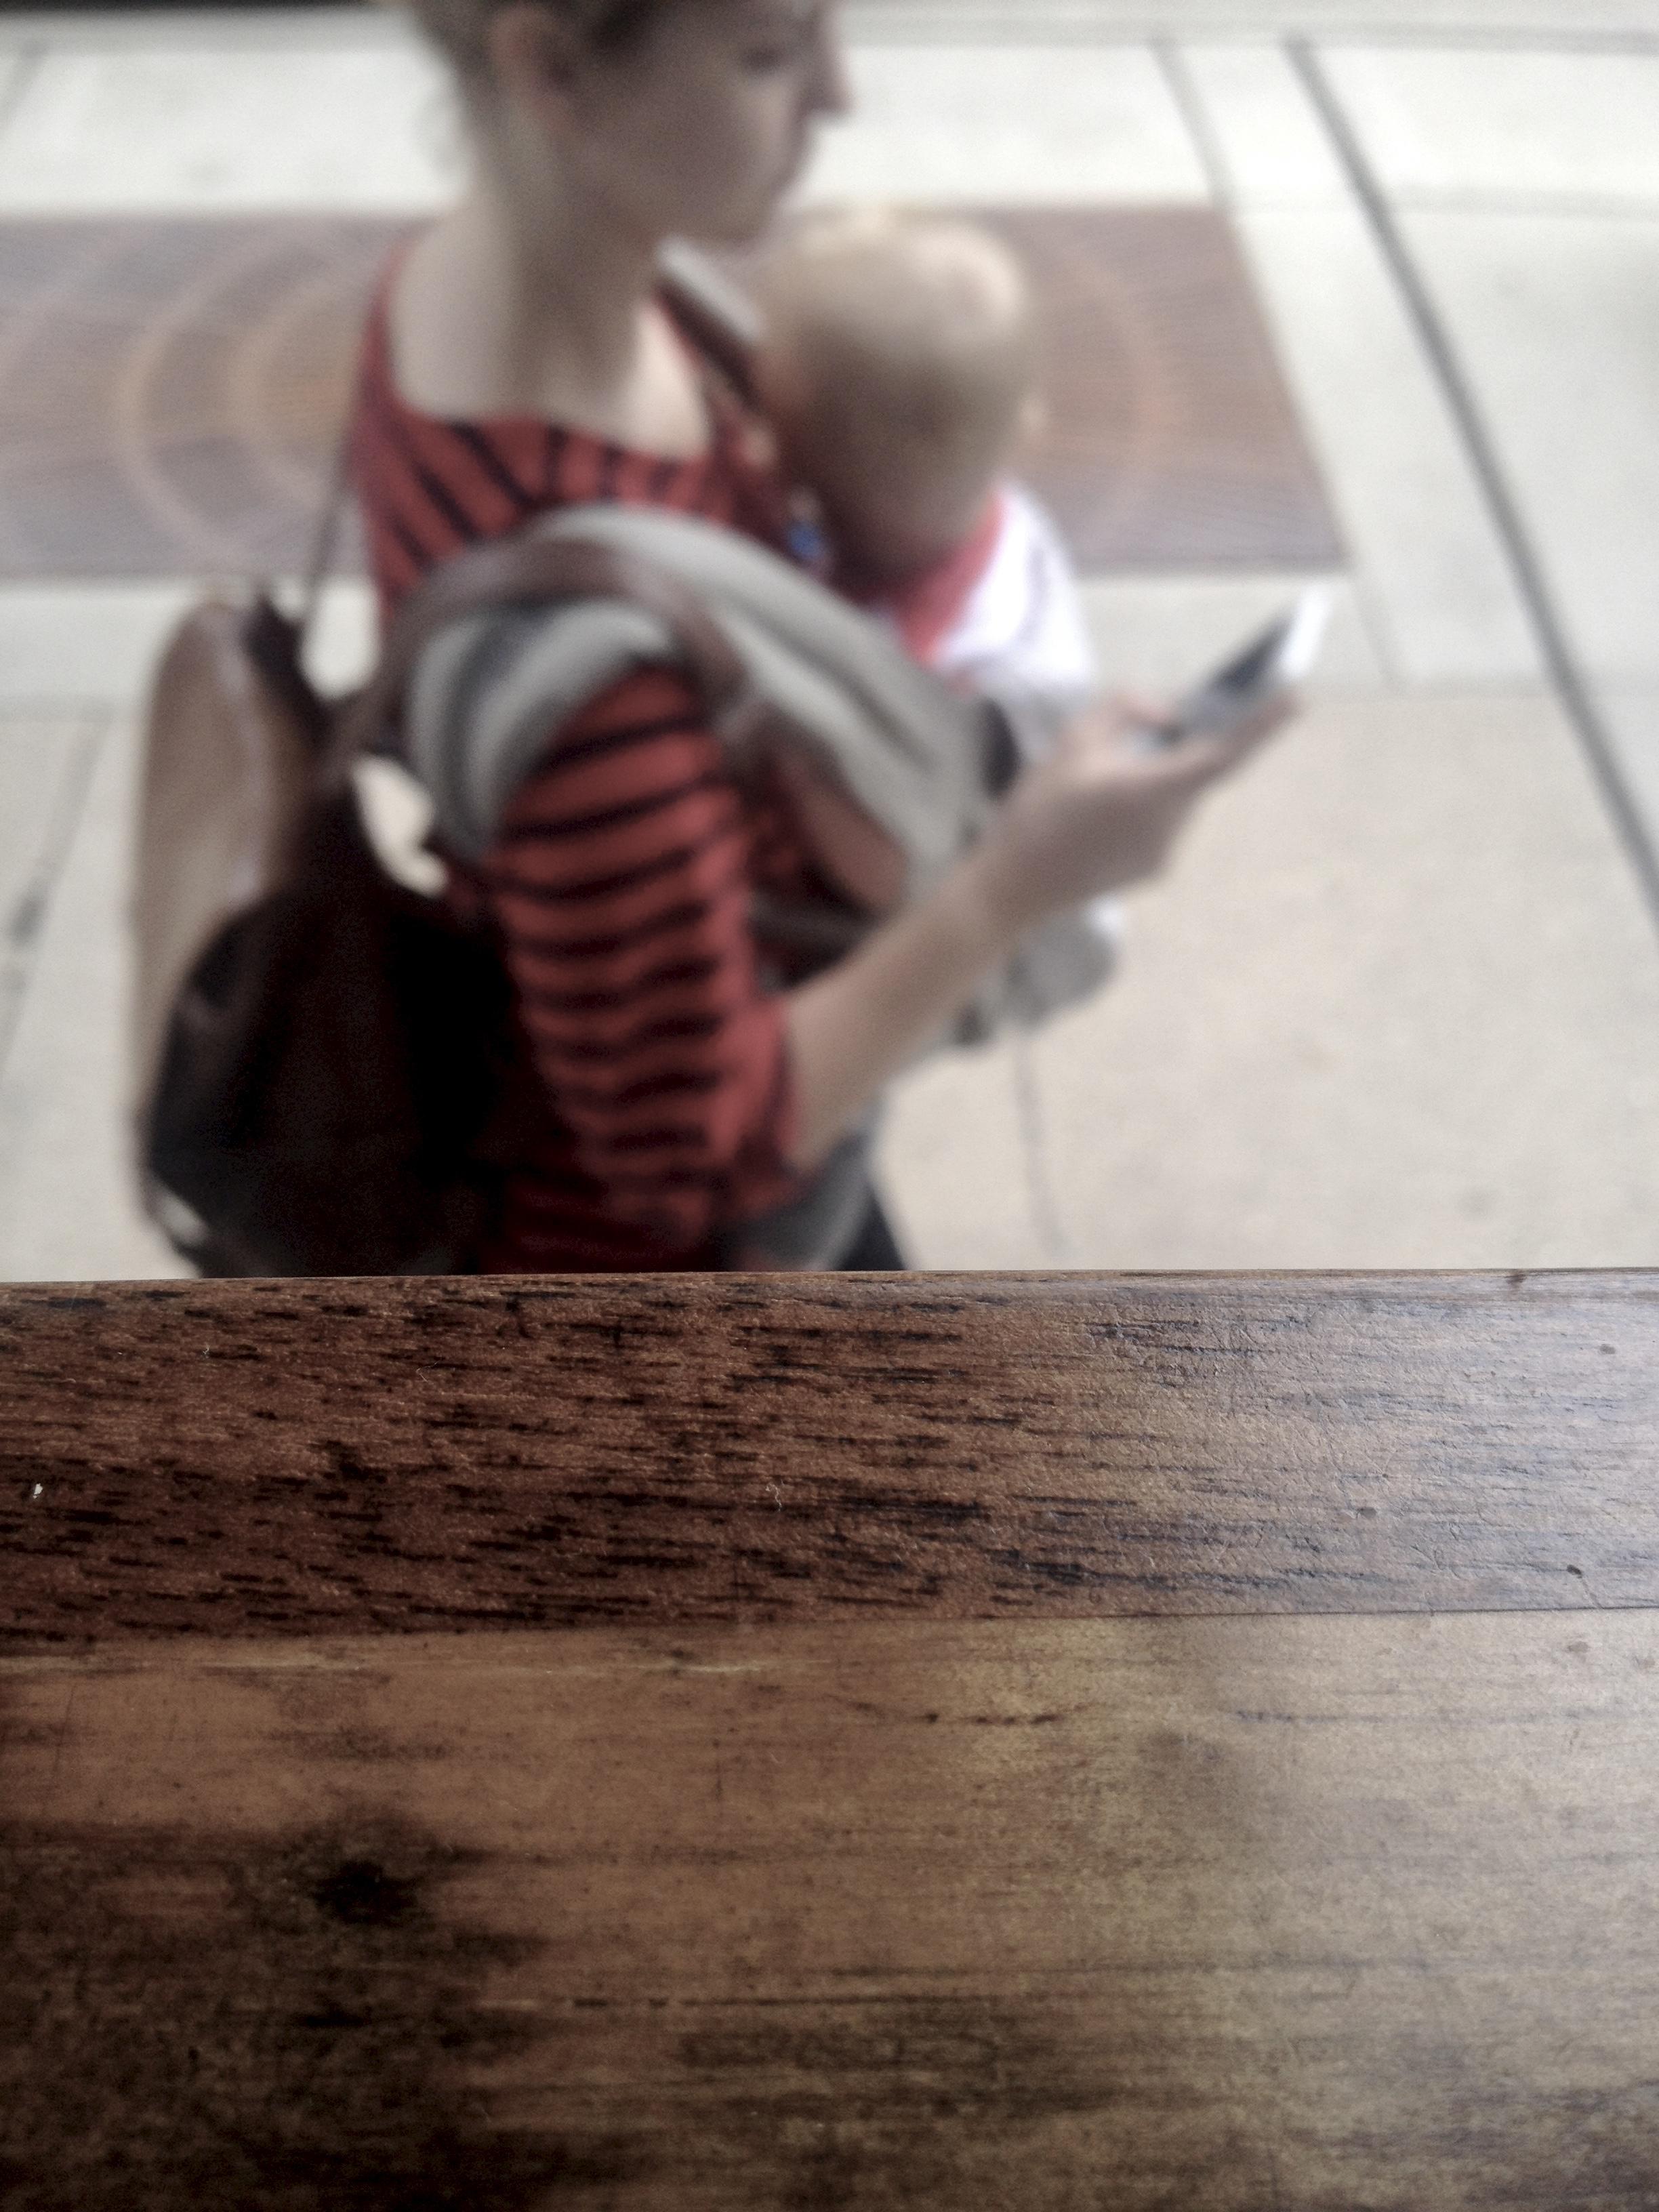 Baby Wearer No. 1. A Coffee Shop Window. Madison, Wisconsin. October 2016. © William D. Walker